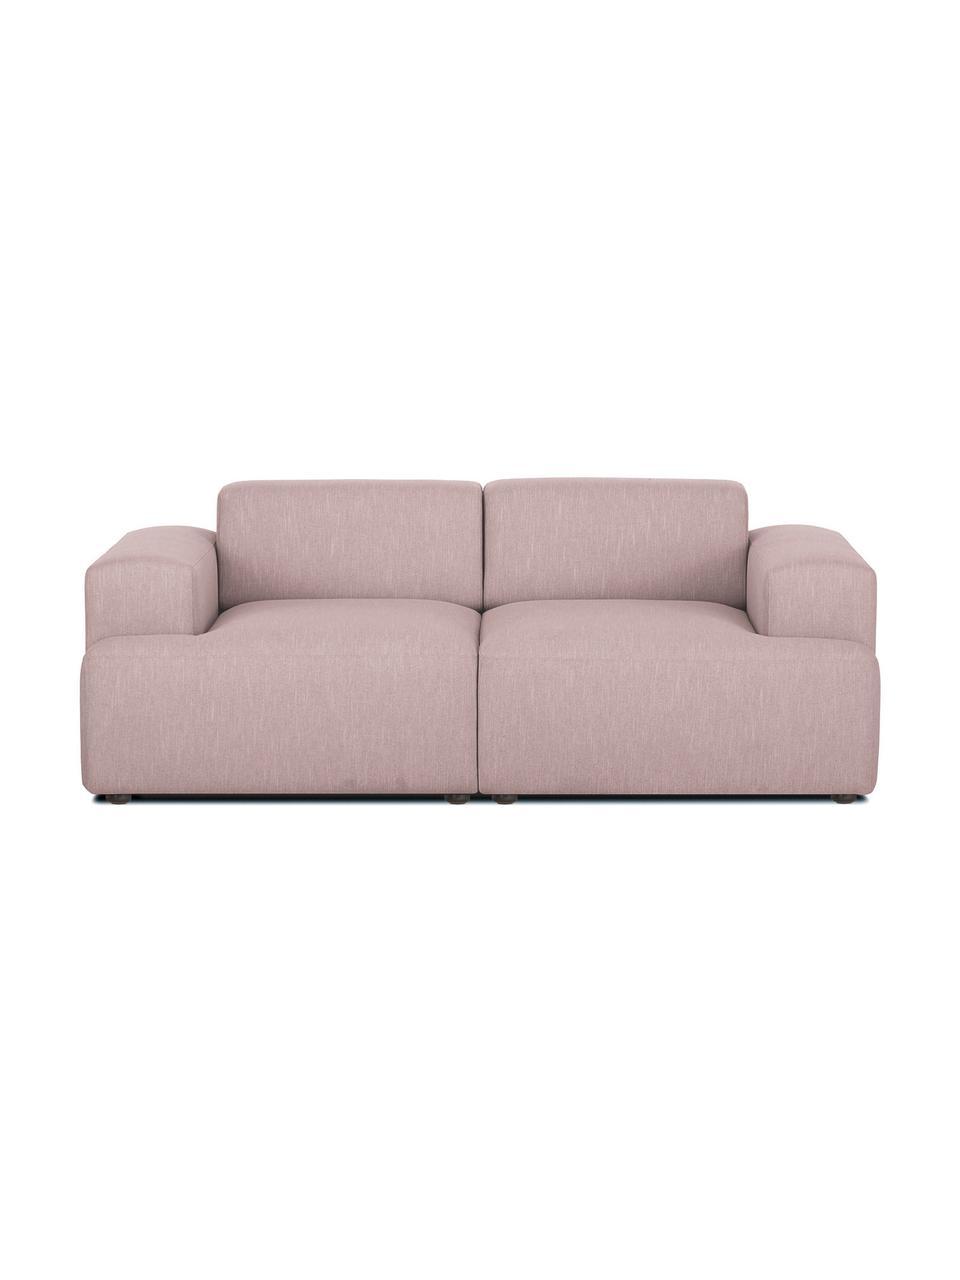 Bank Melva (2-zits) in roze, Bekleding: 100% polyester, Frame: massief grenenhout, FSC-g, Poten: kunststof, Geweven stof roze, 198 x 101 cm